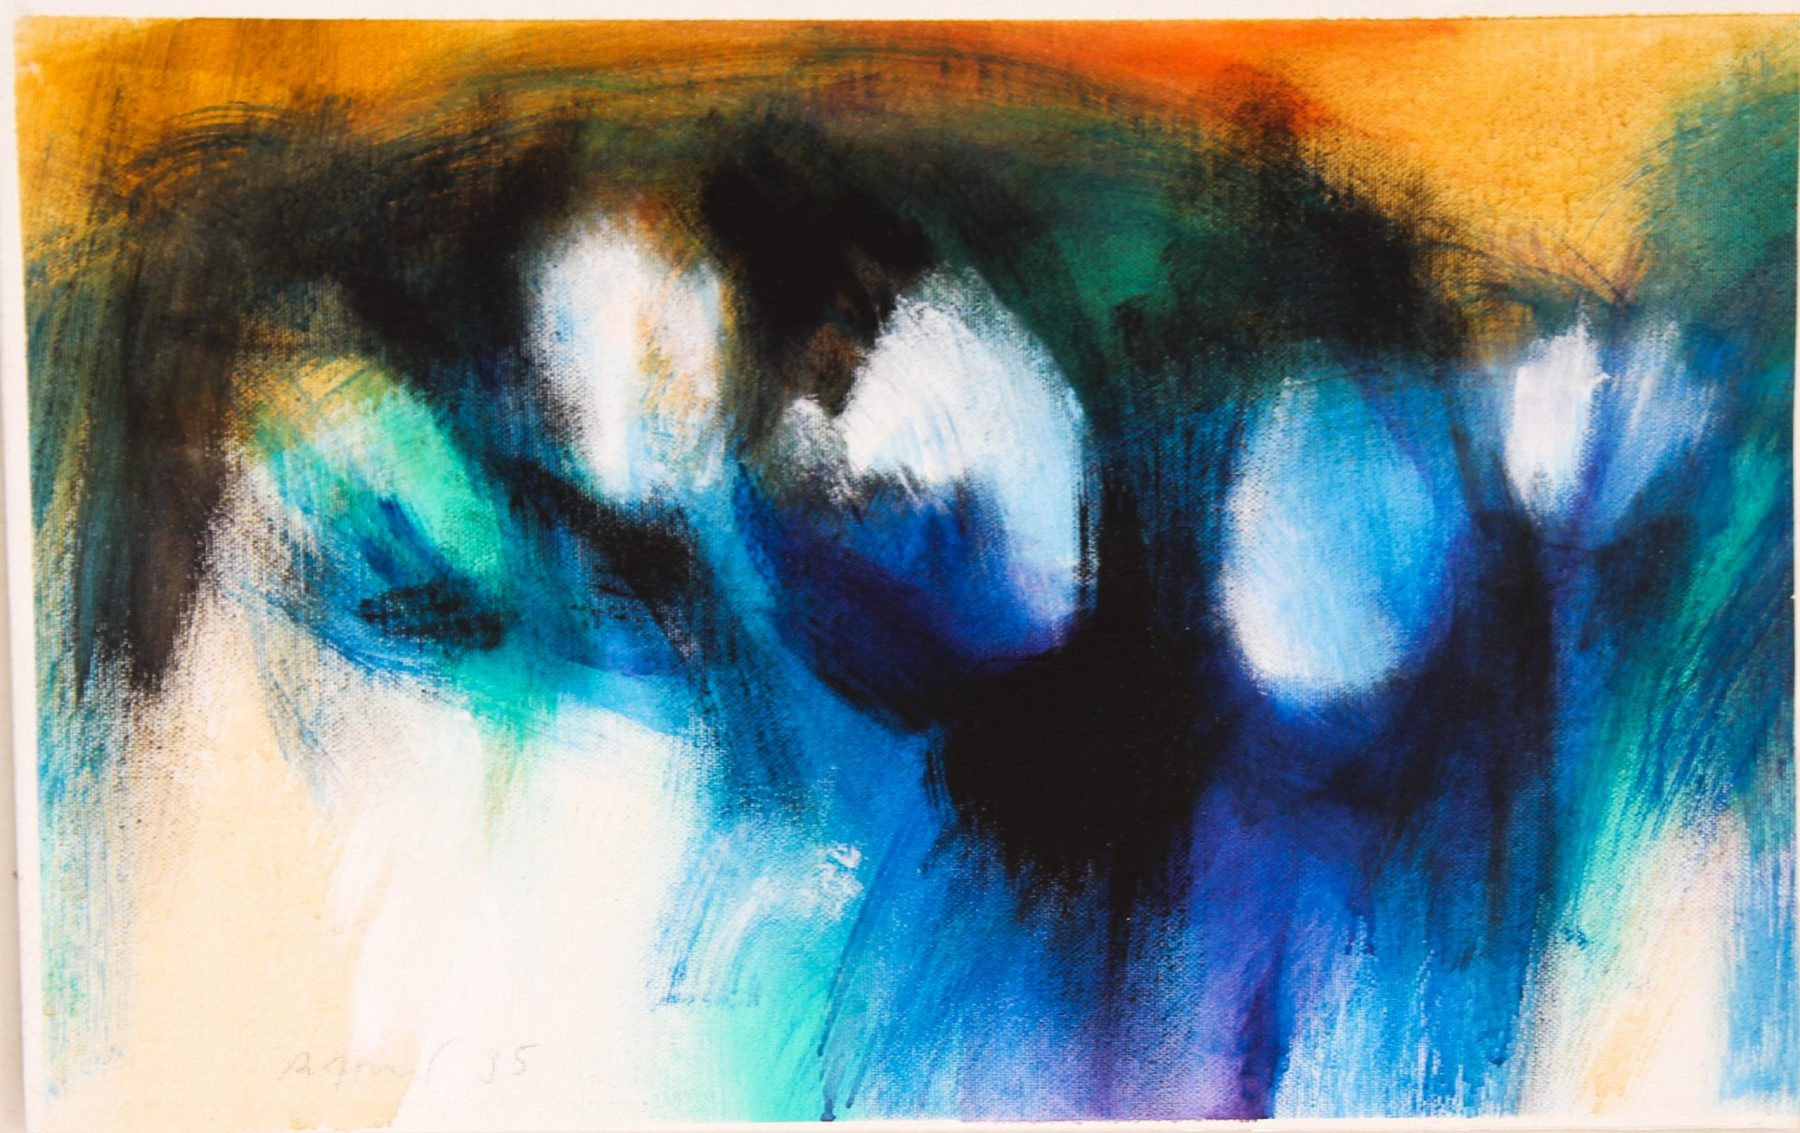 Blaue Tulpen - Aeffner, Thomas - k-10303